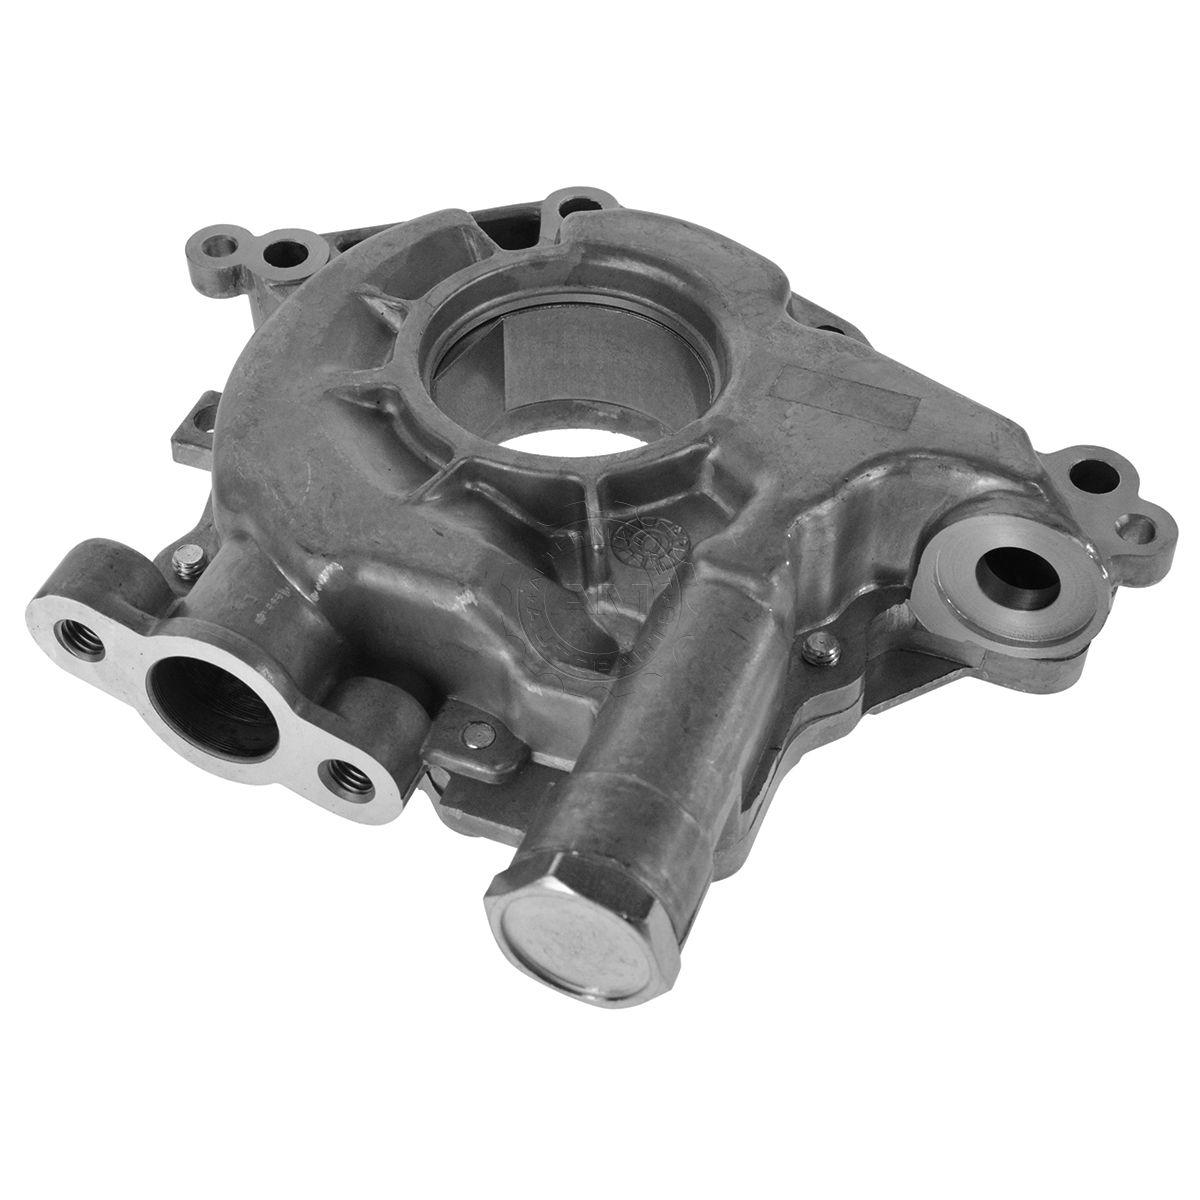 Engine Oil Pump For Nissan Altima Maxima Quest V6 3.5L 192659206138